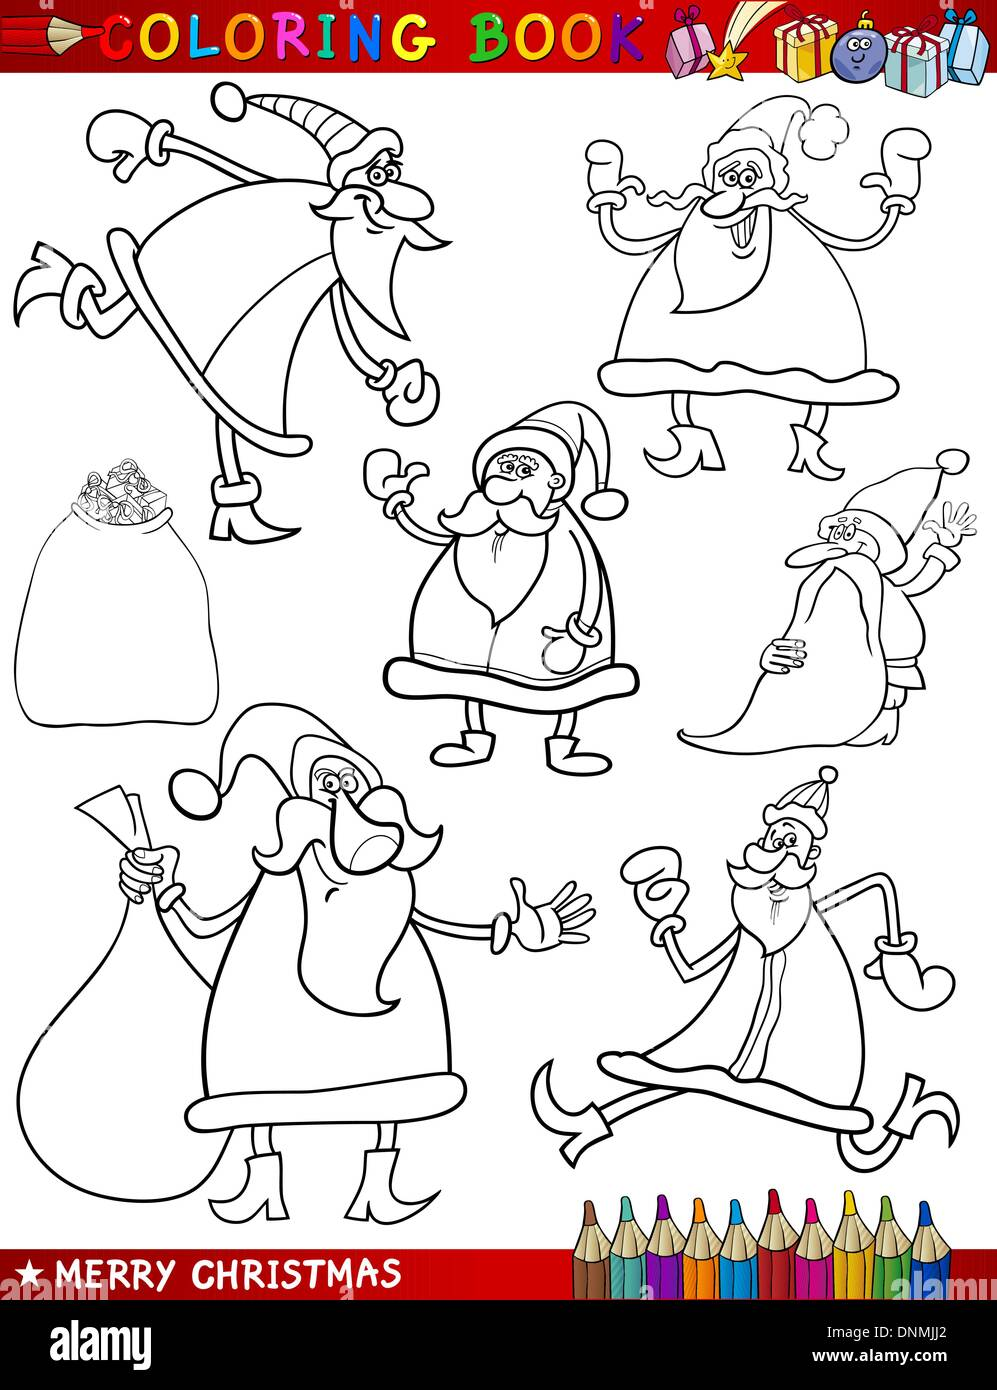 Asombroso Navidad Santa Claus Para Colorear Molde - Ideas Creativas ...